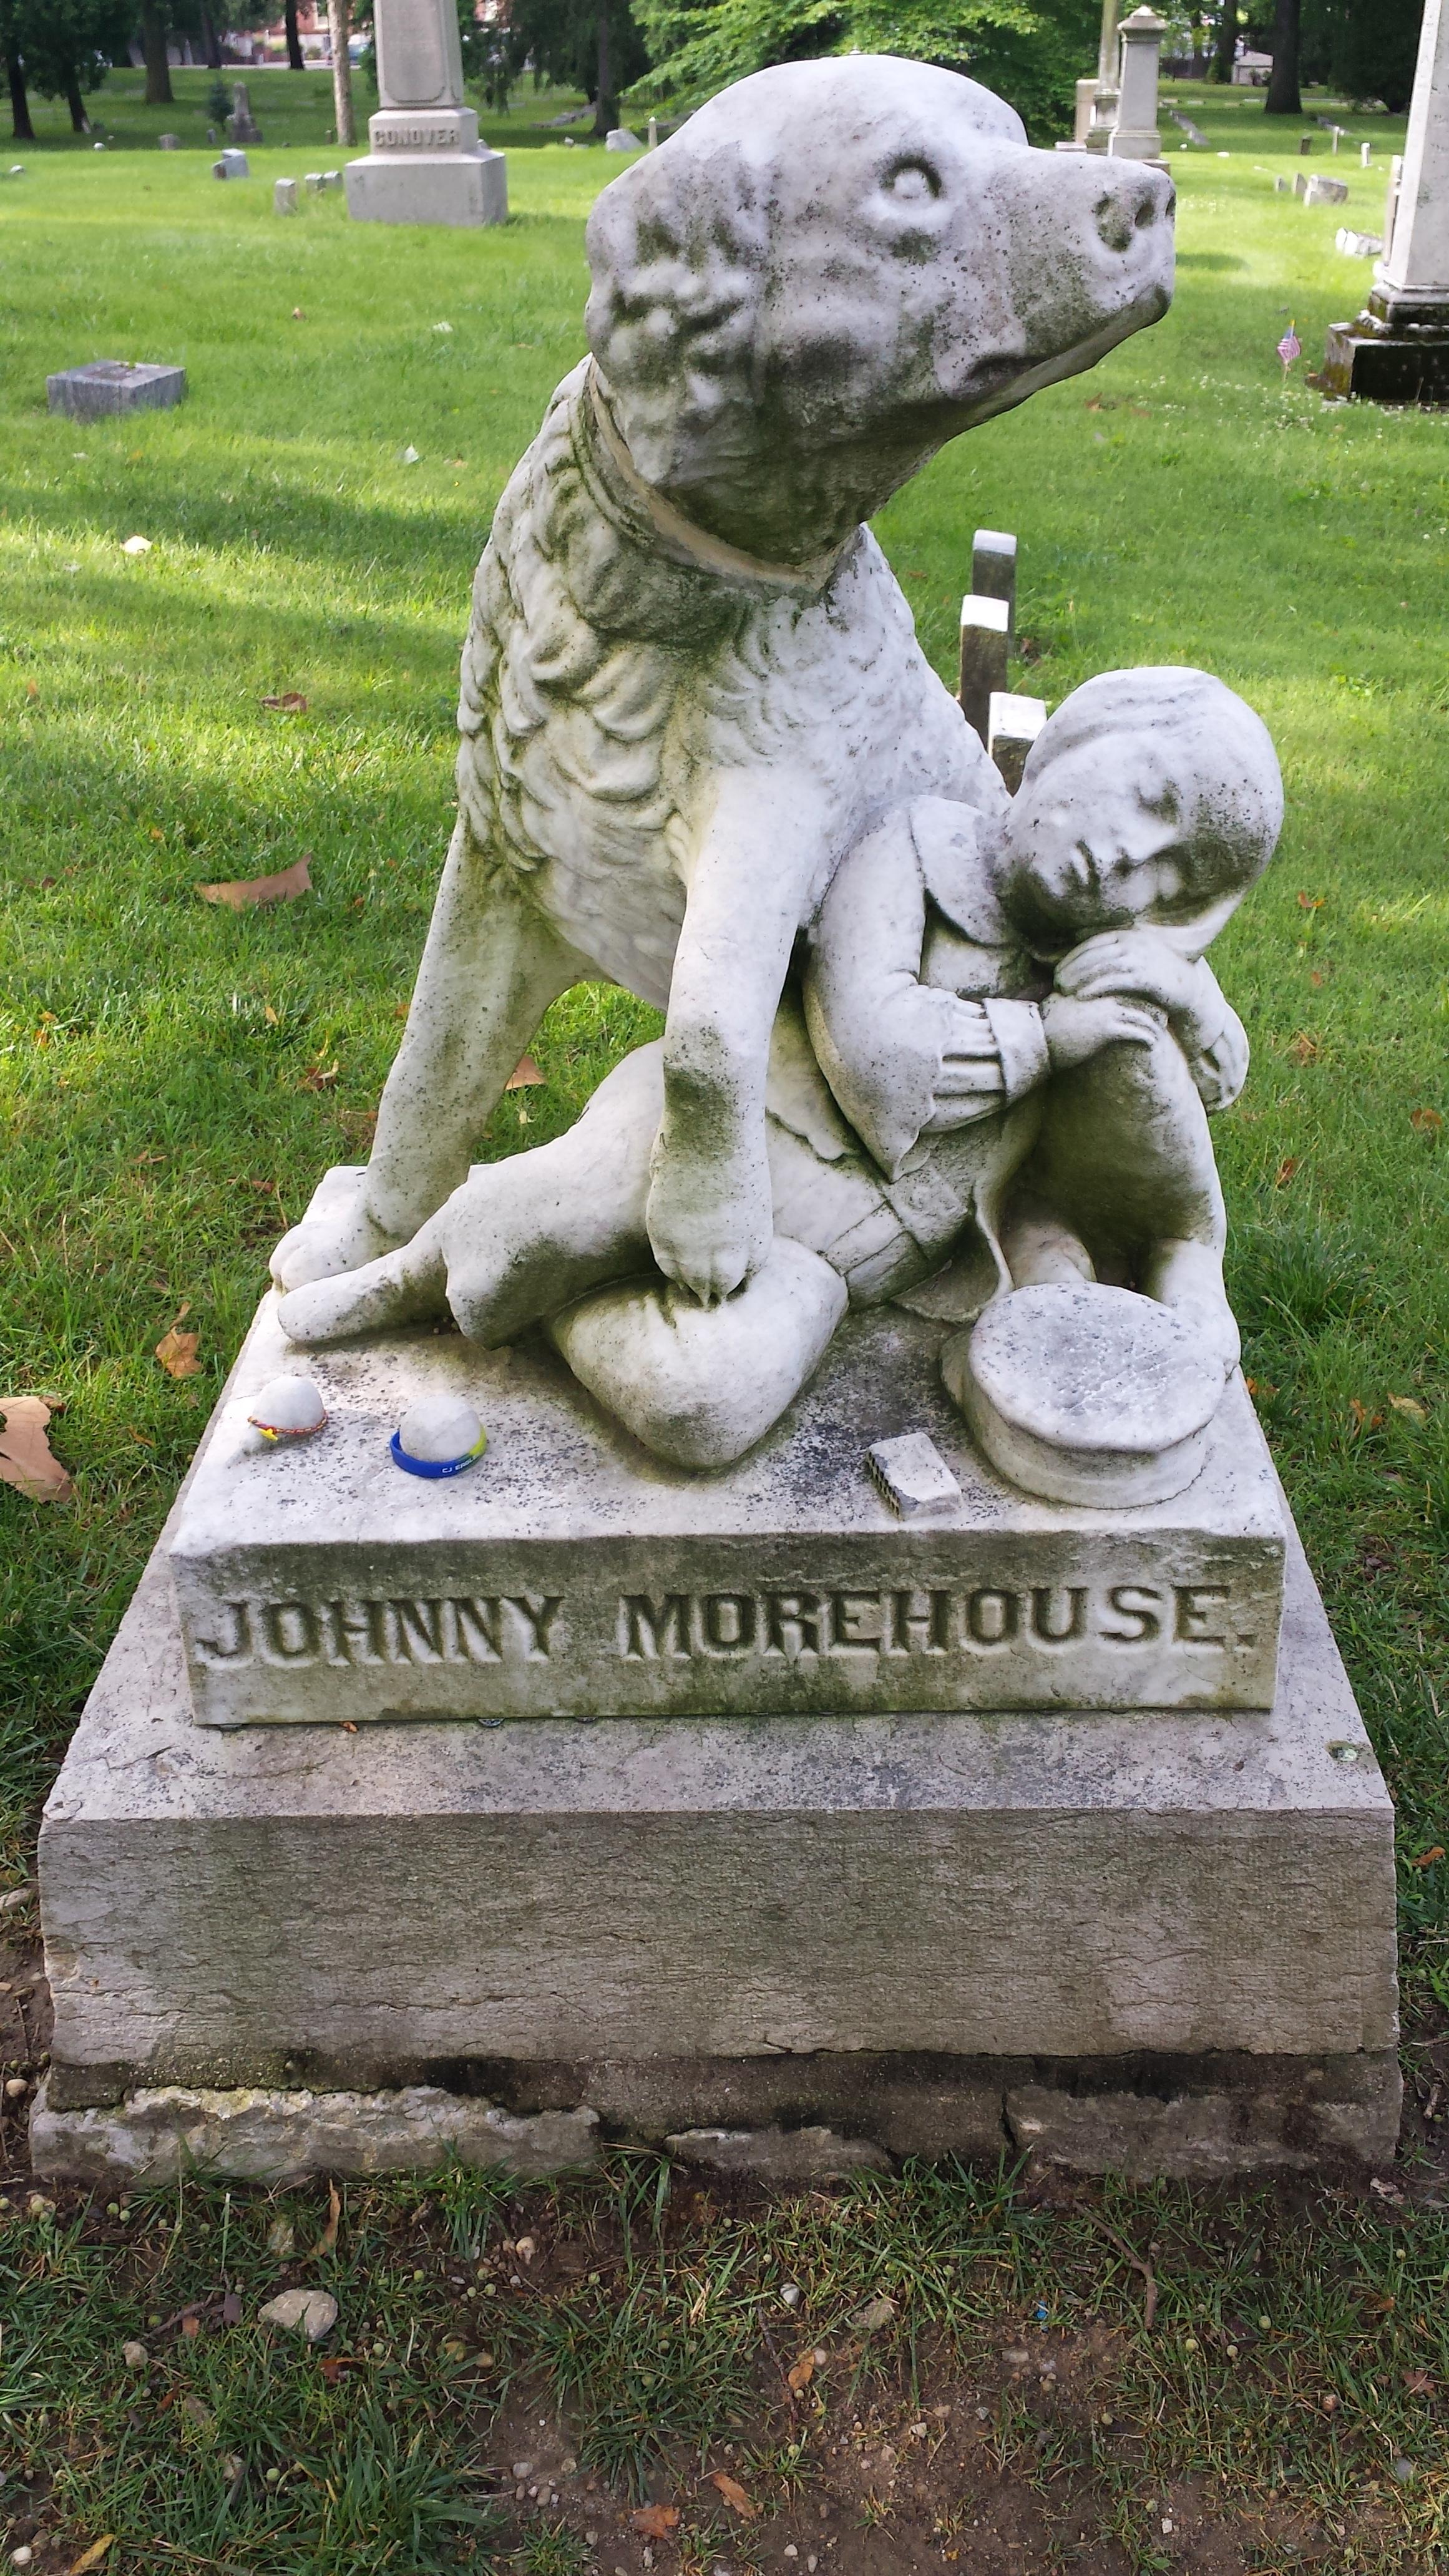 Caption: Johnny Morehouse Memorial, Credit: Renee Wilde